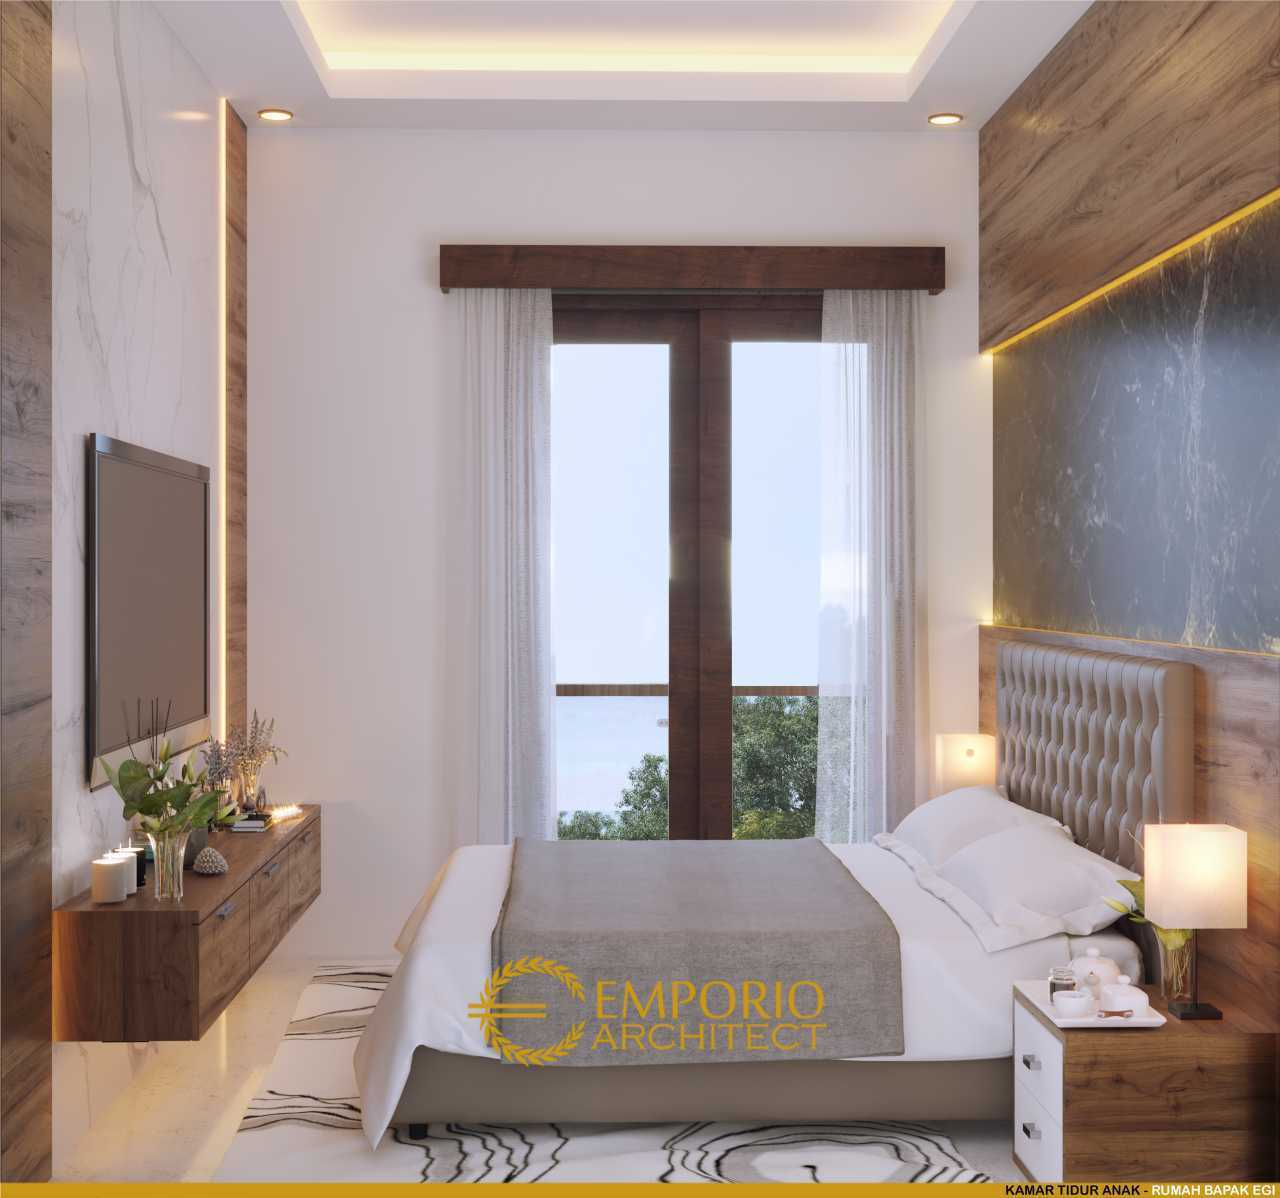 Emporio Architect Jasa Arsitek Denpasar Desain Rumah Modern Tropis 734 @ Denpasar, Bali Kota Denpasar, Bali, Indonesia Kota Denpasar, Bali, Indonesia Emporio-Architect-Jasa-Arsitek-Denpasar-Desain-Rumah-Modern-Tropis-734-Denpasar-Bali  85484